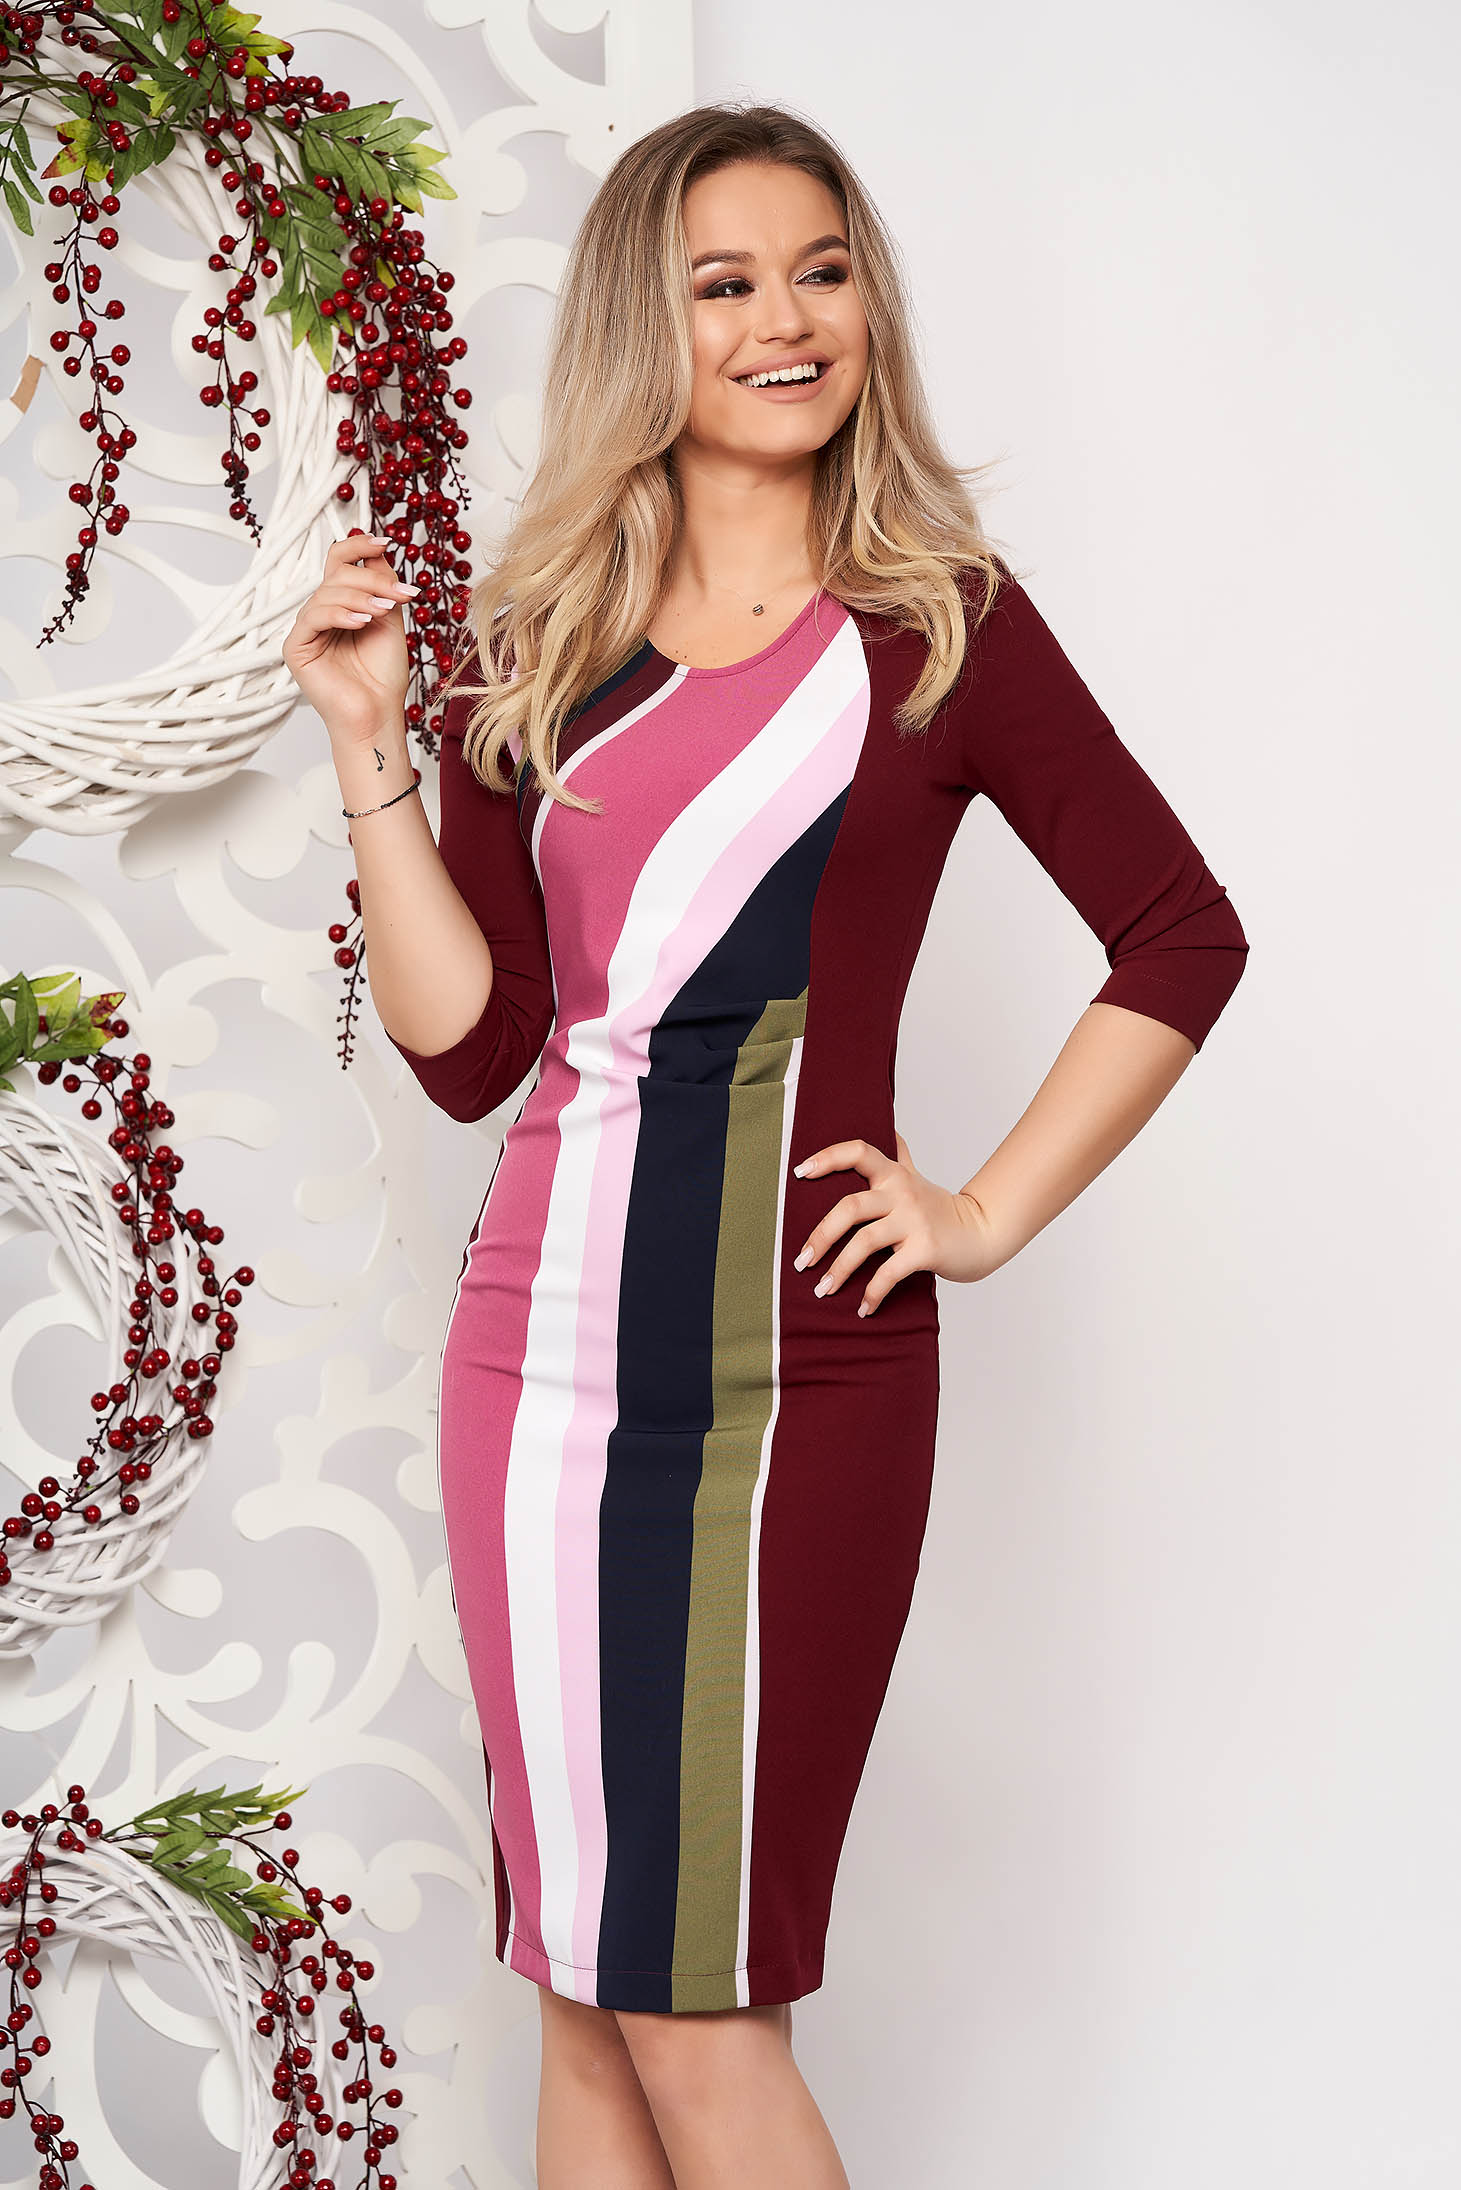 StarShinerS burgundy office midi pencil dress 3/4 sleeve slightly elastic fabric with stripes